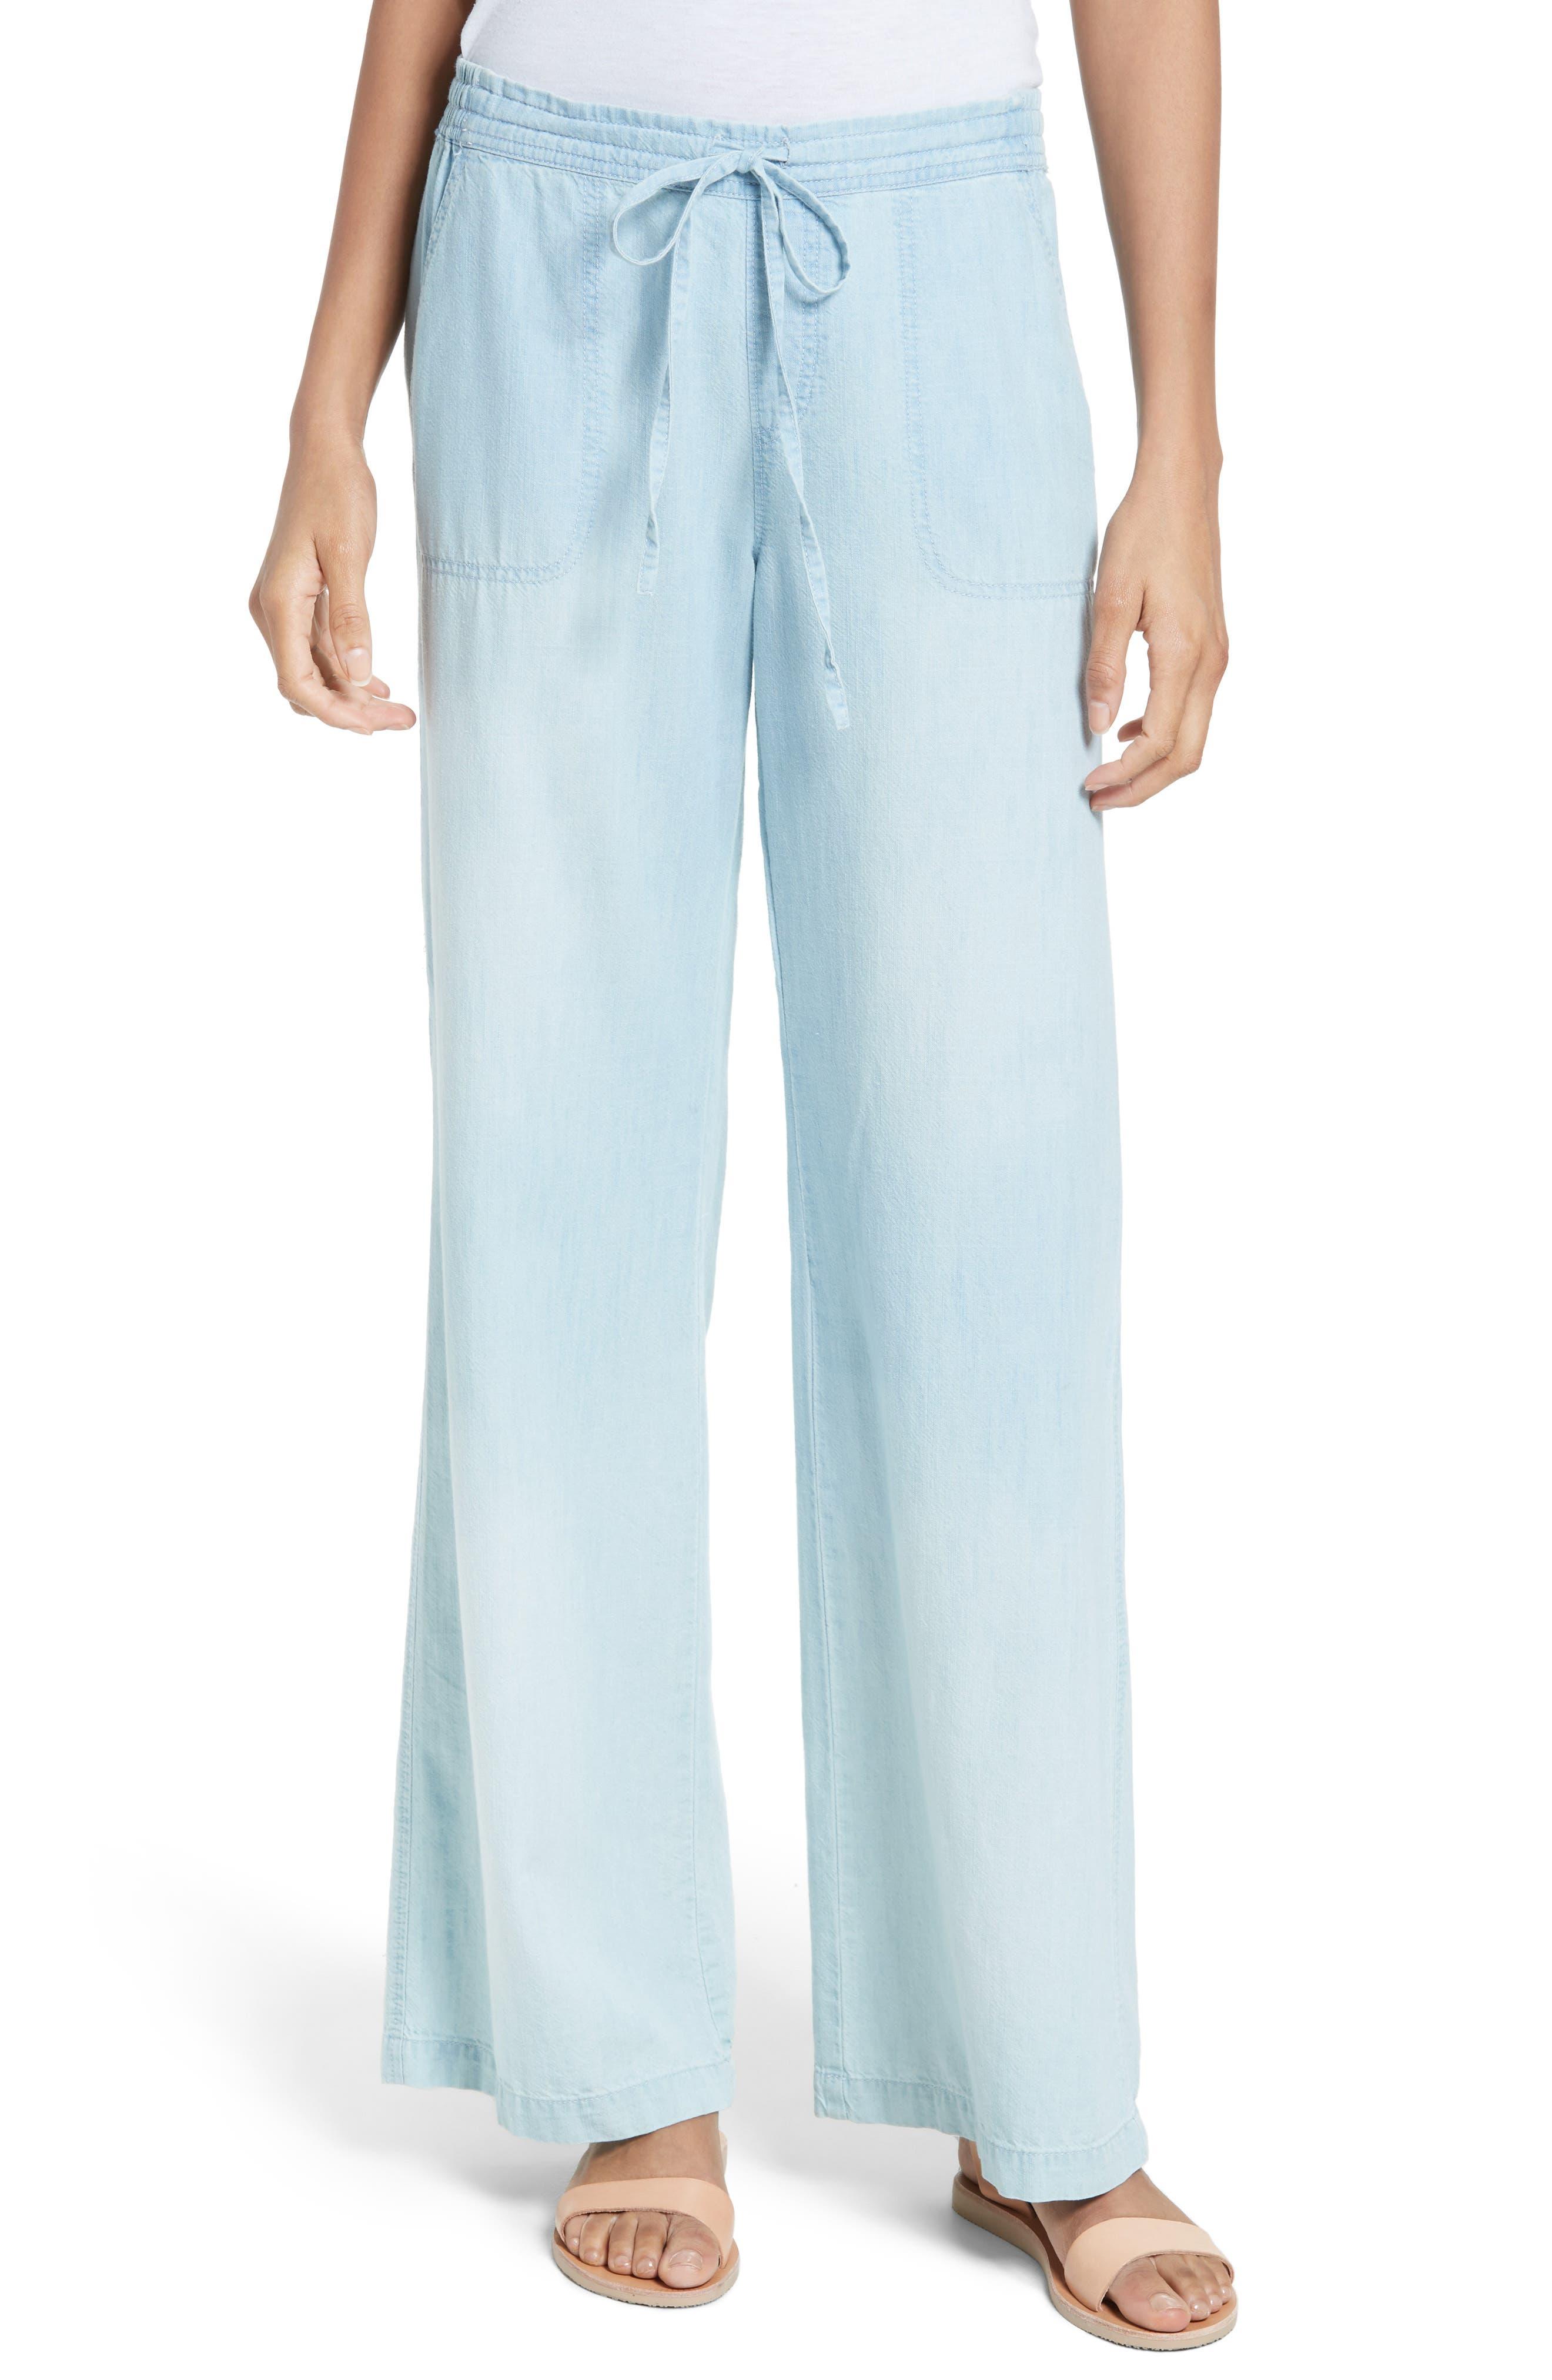 Soft Joie Kamini Chambray Pants